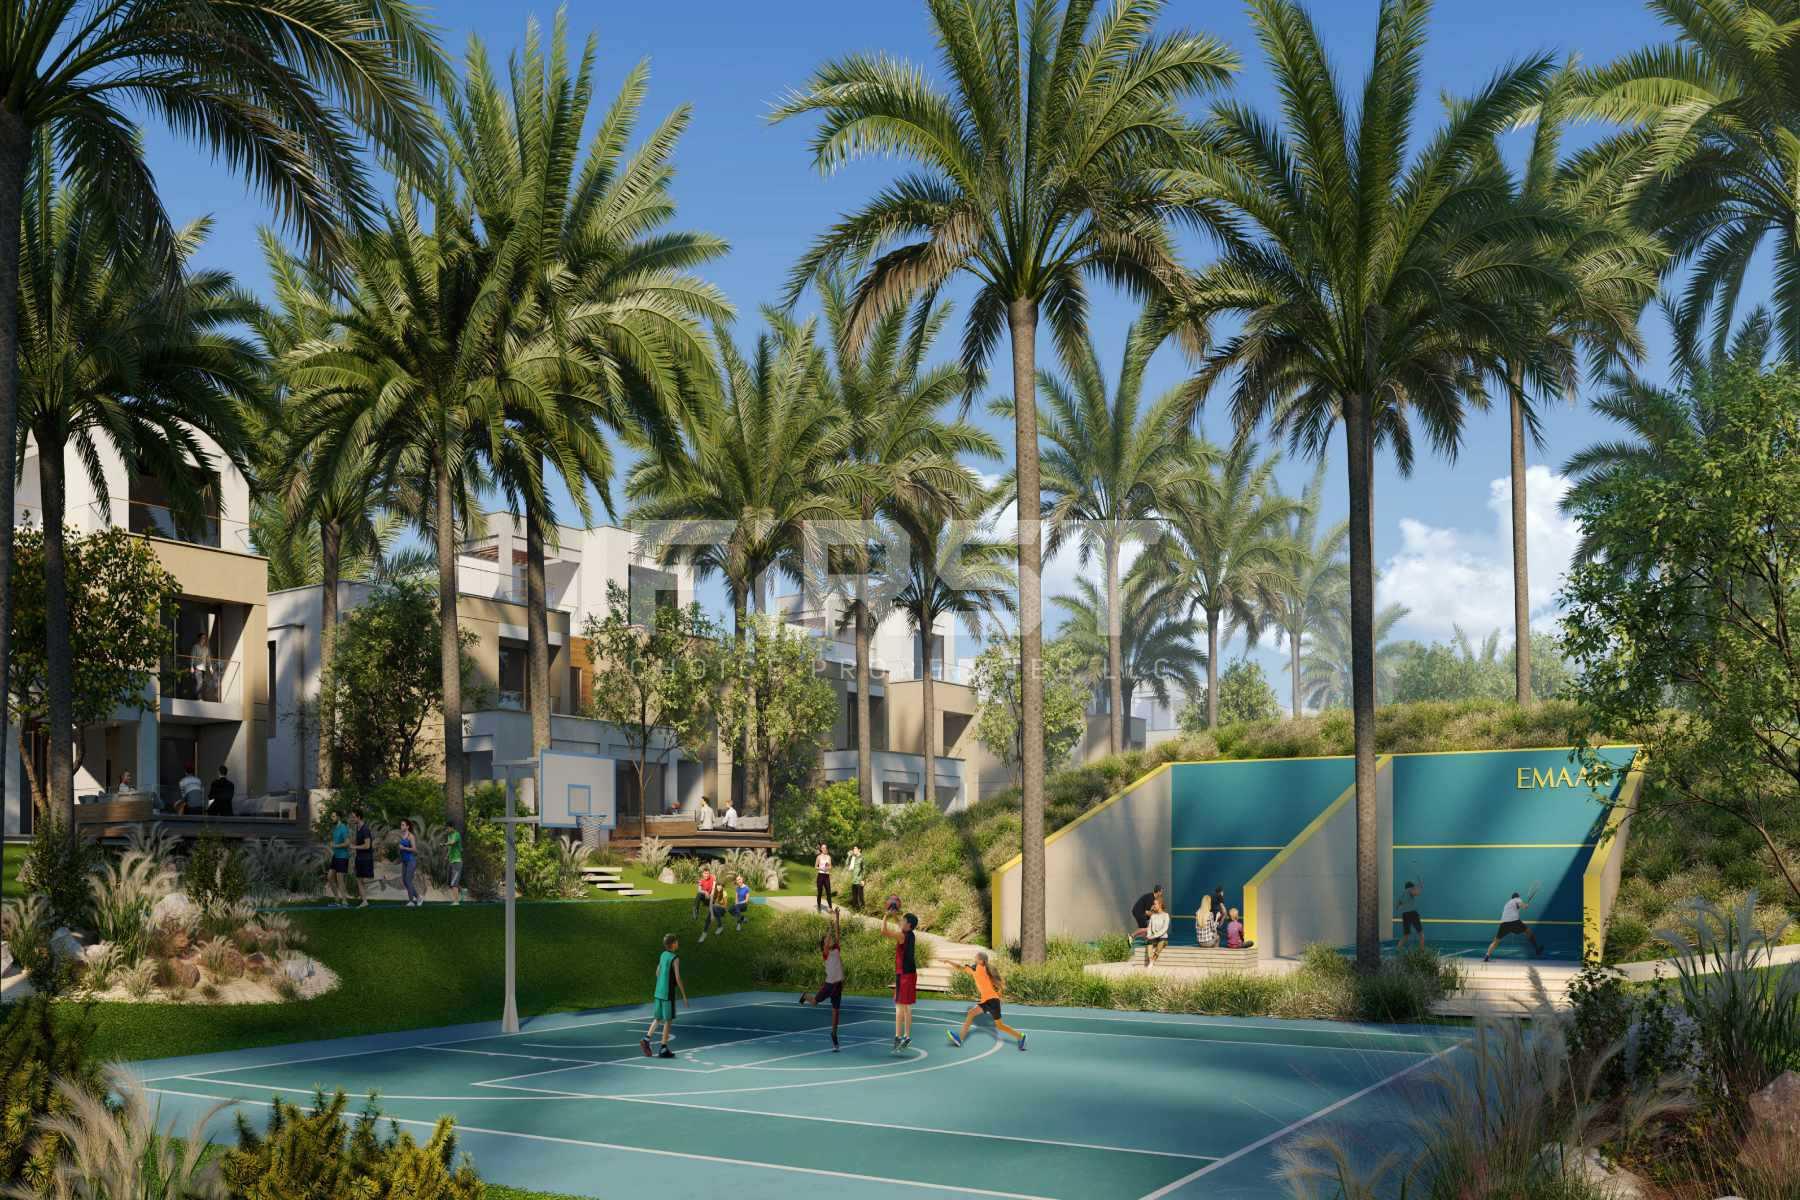 External Photo of Arabian Ranches III Caya Dubai UAE (1).jpg